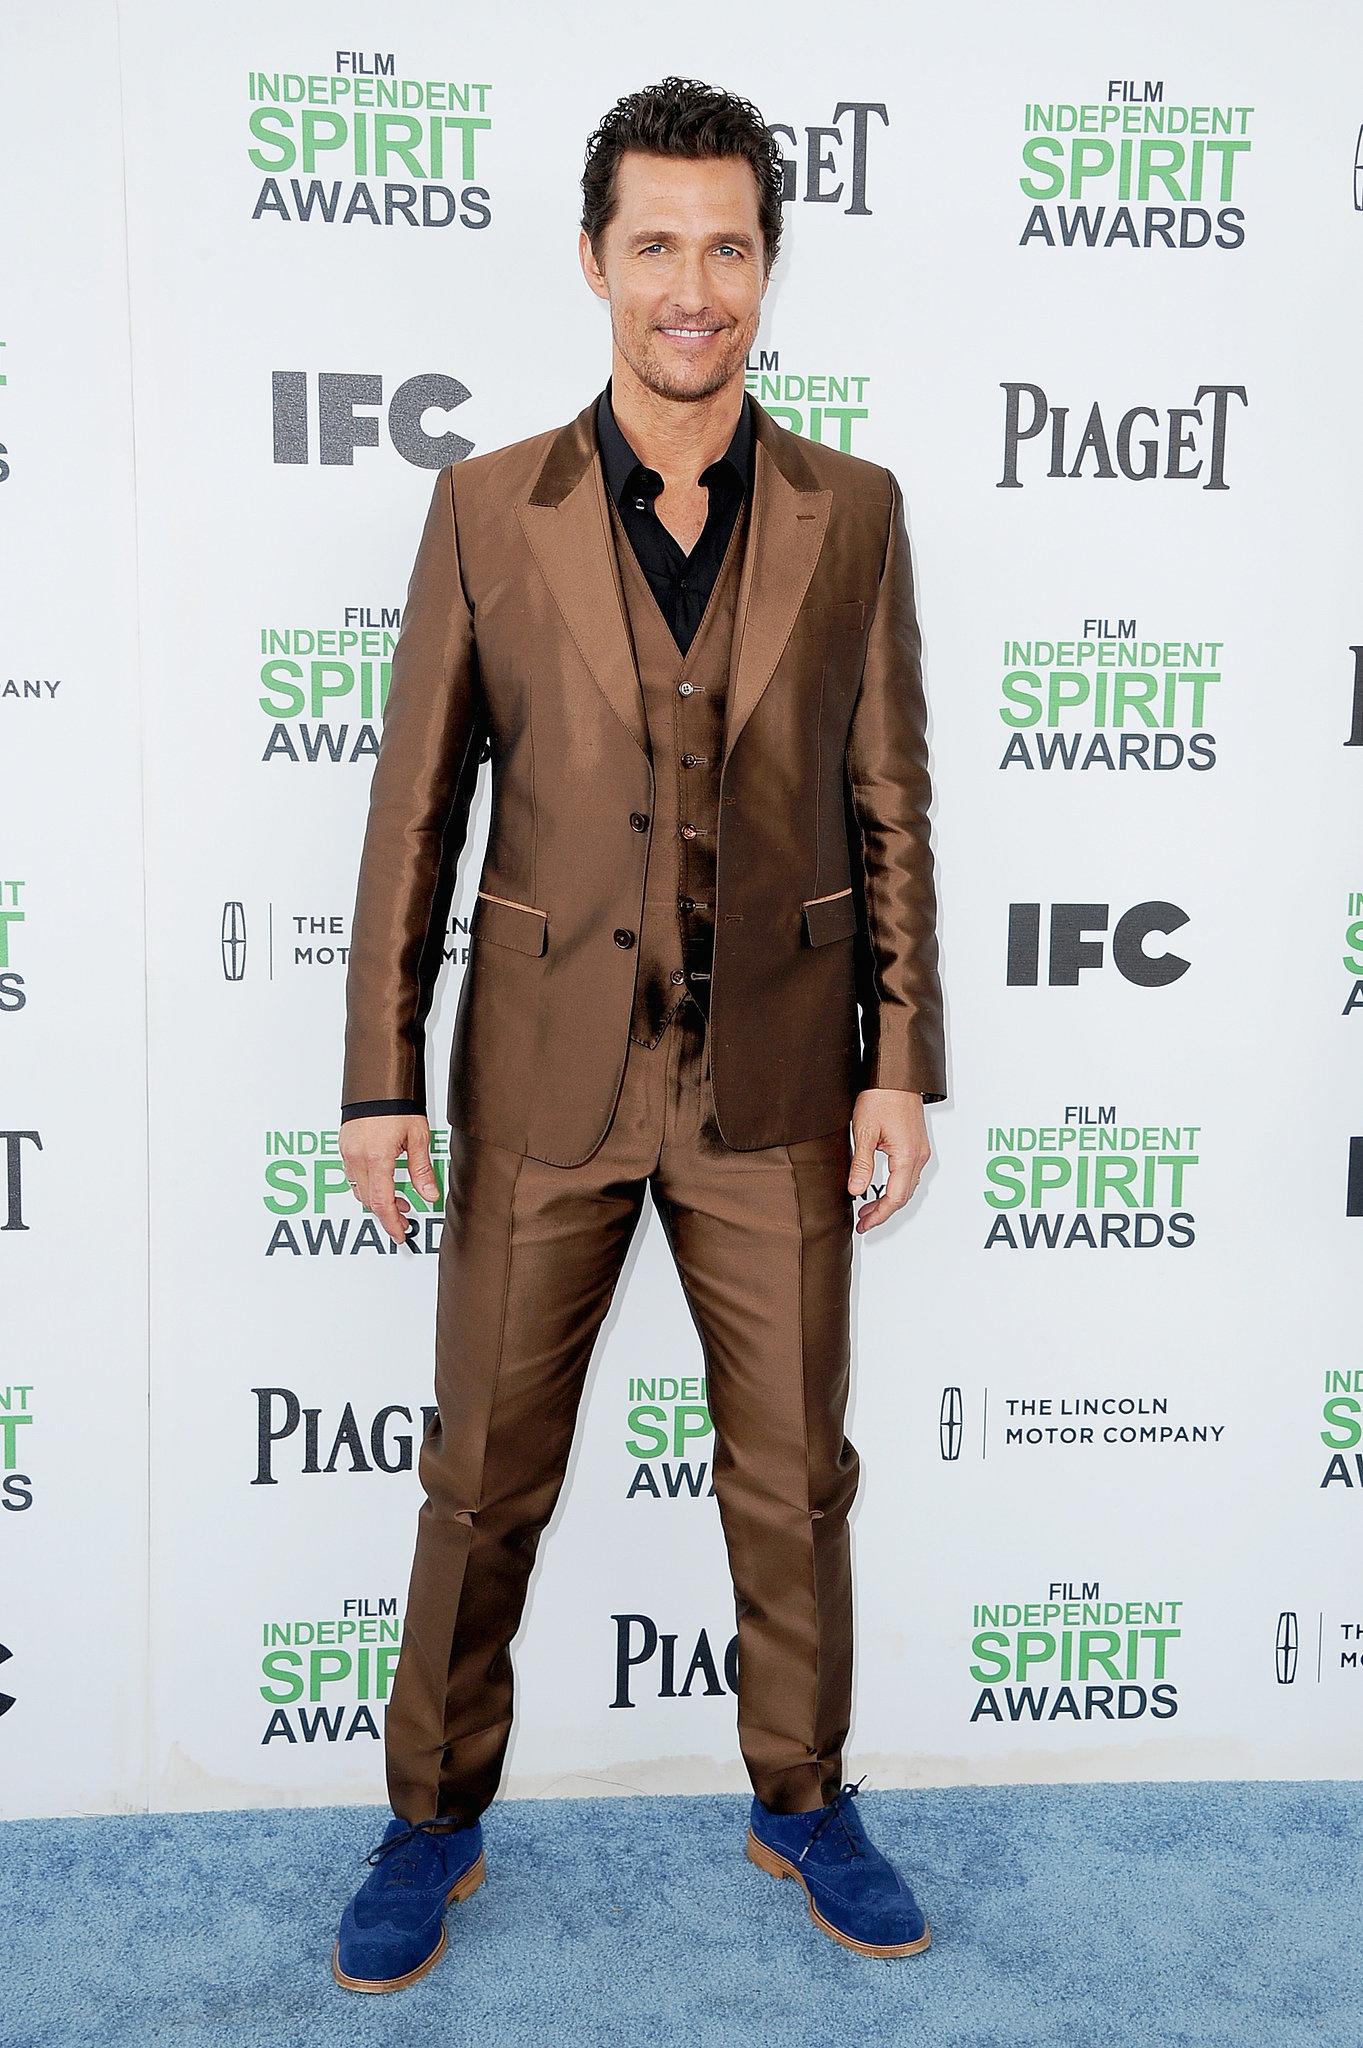 It's Already a Winning Weekend For Matthew McConaughey